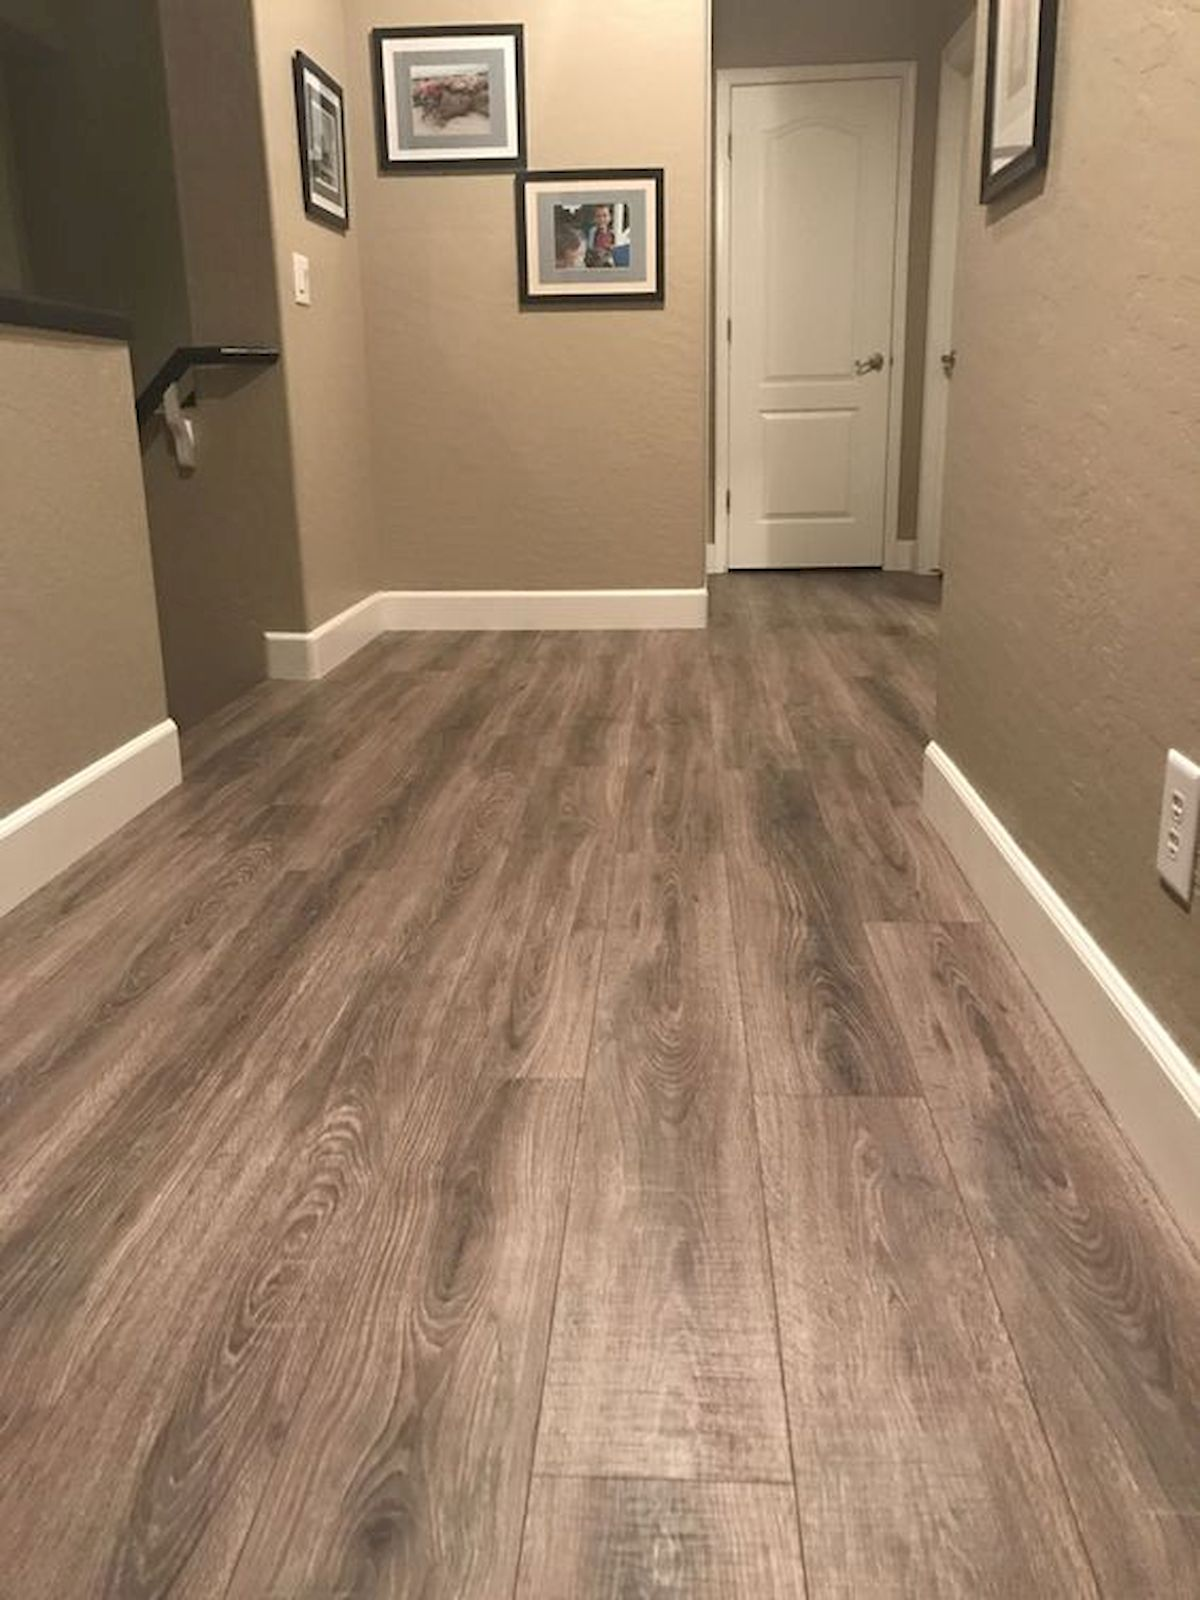 80 Gorgeous Hardwood Floor Ideas for Interior Home (35)